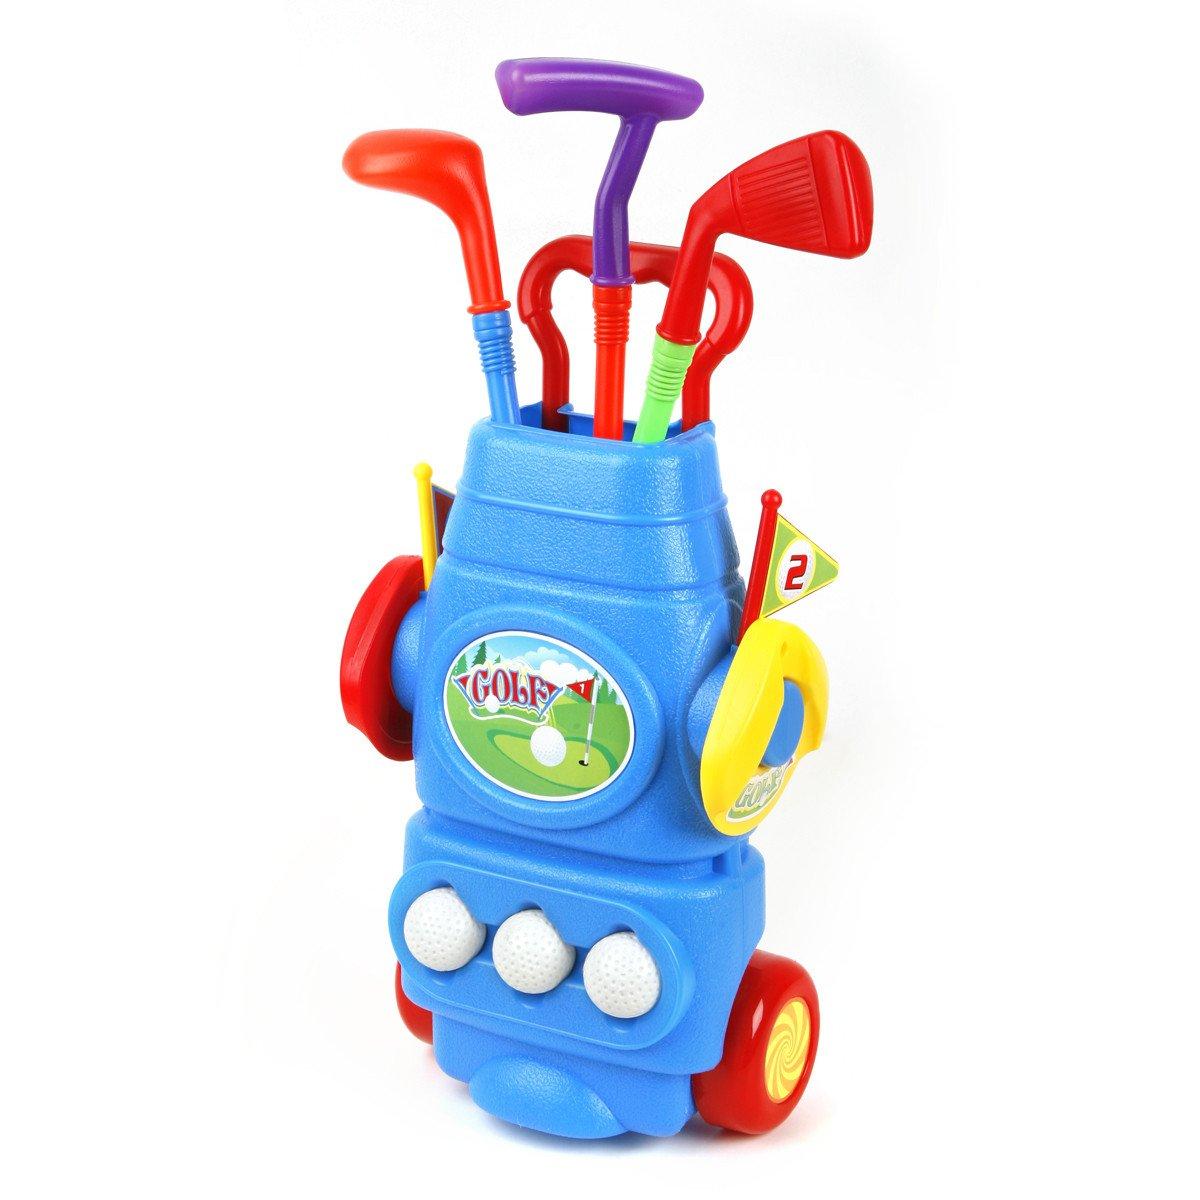 Ojam Swing 'N Play Kids Toy Golf Set (9) (9 Piece) by Ojam (Image #2)